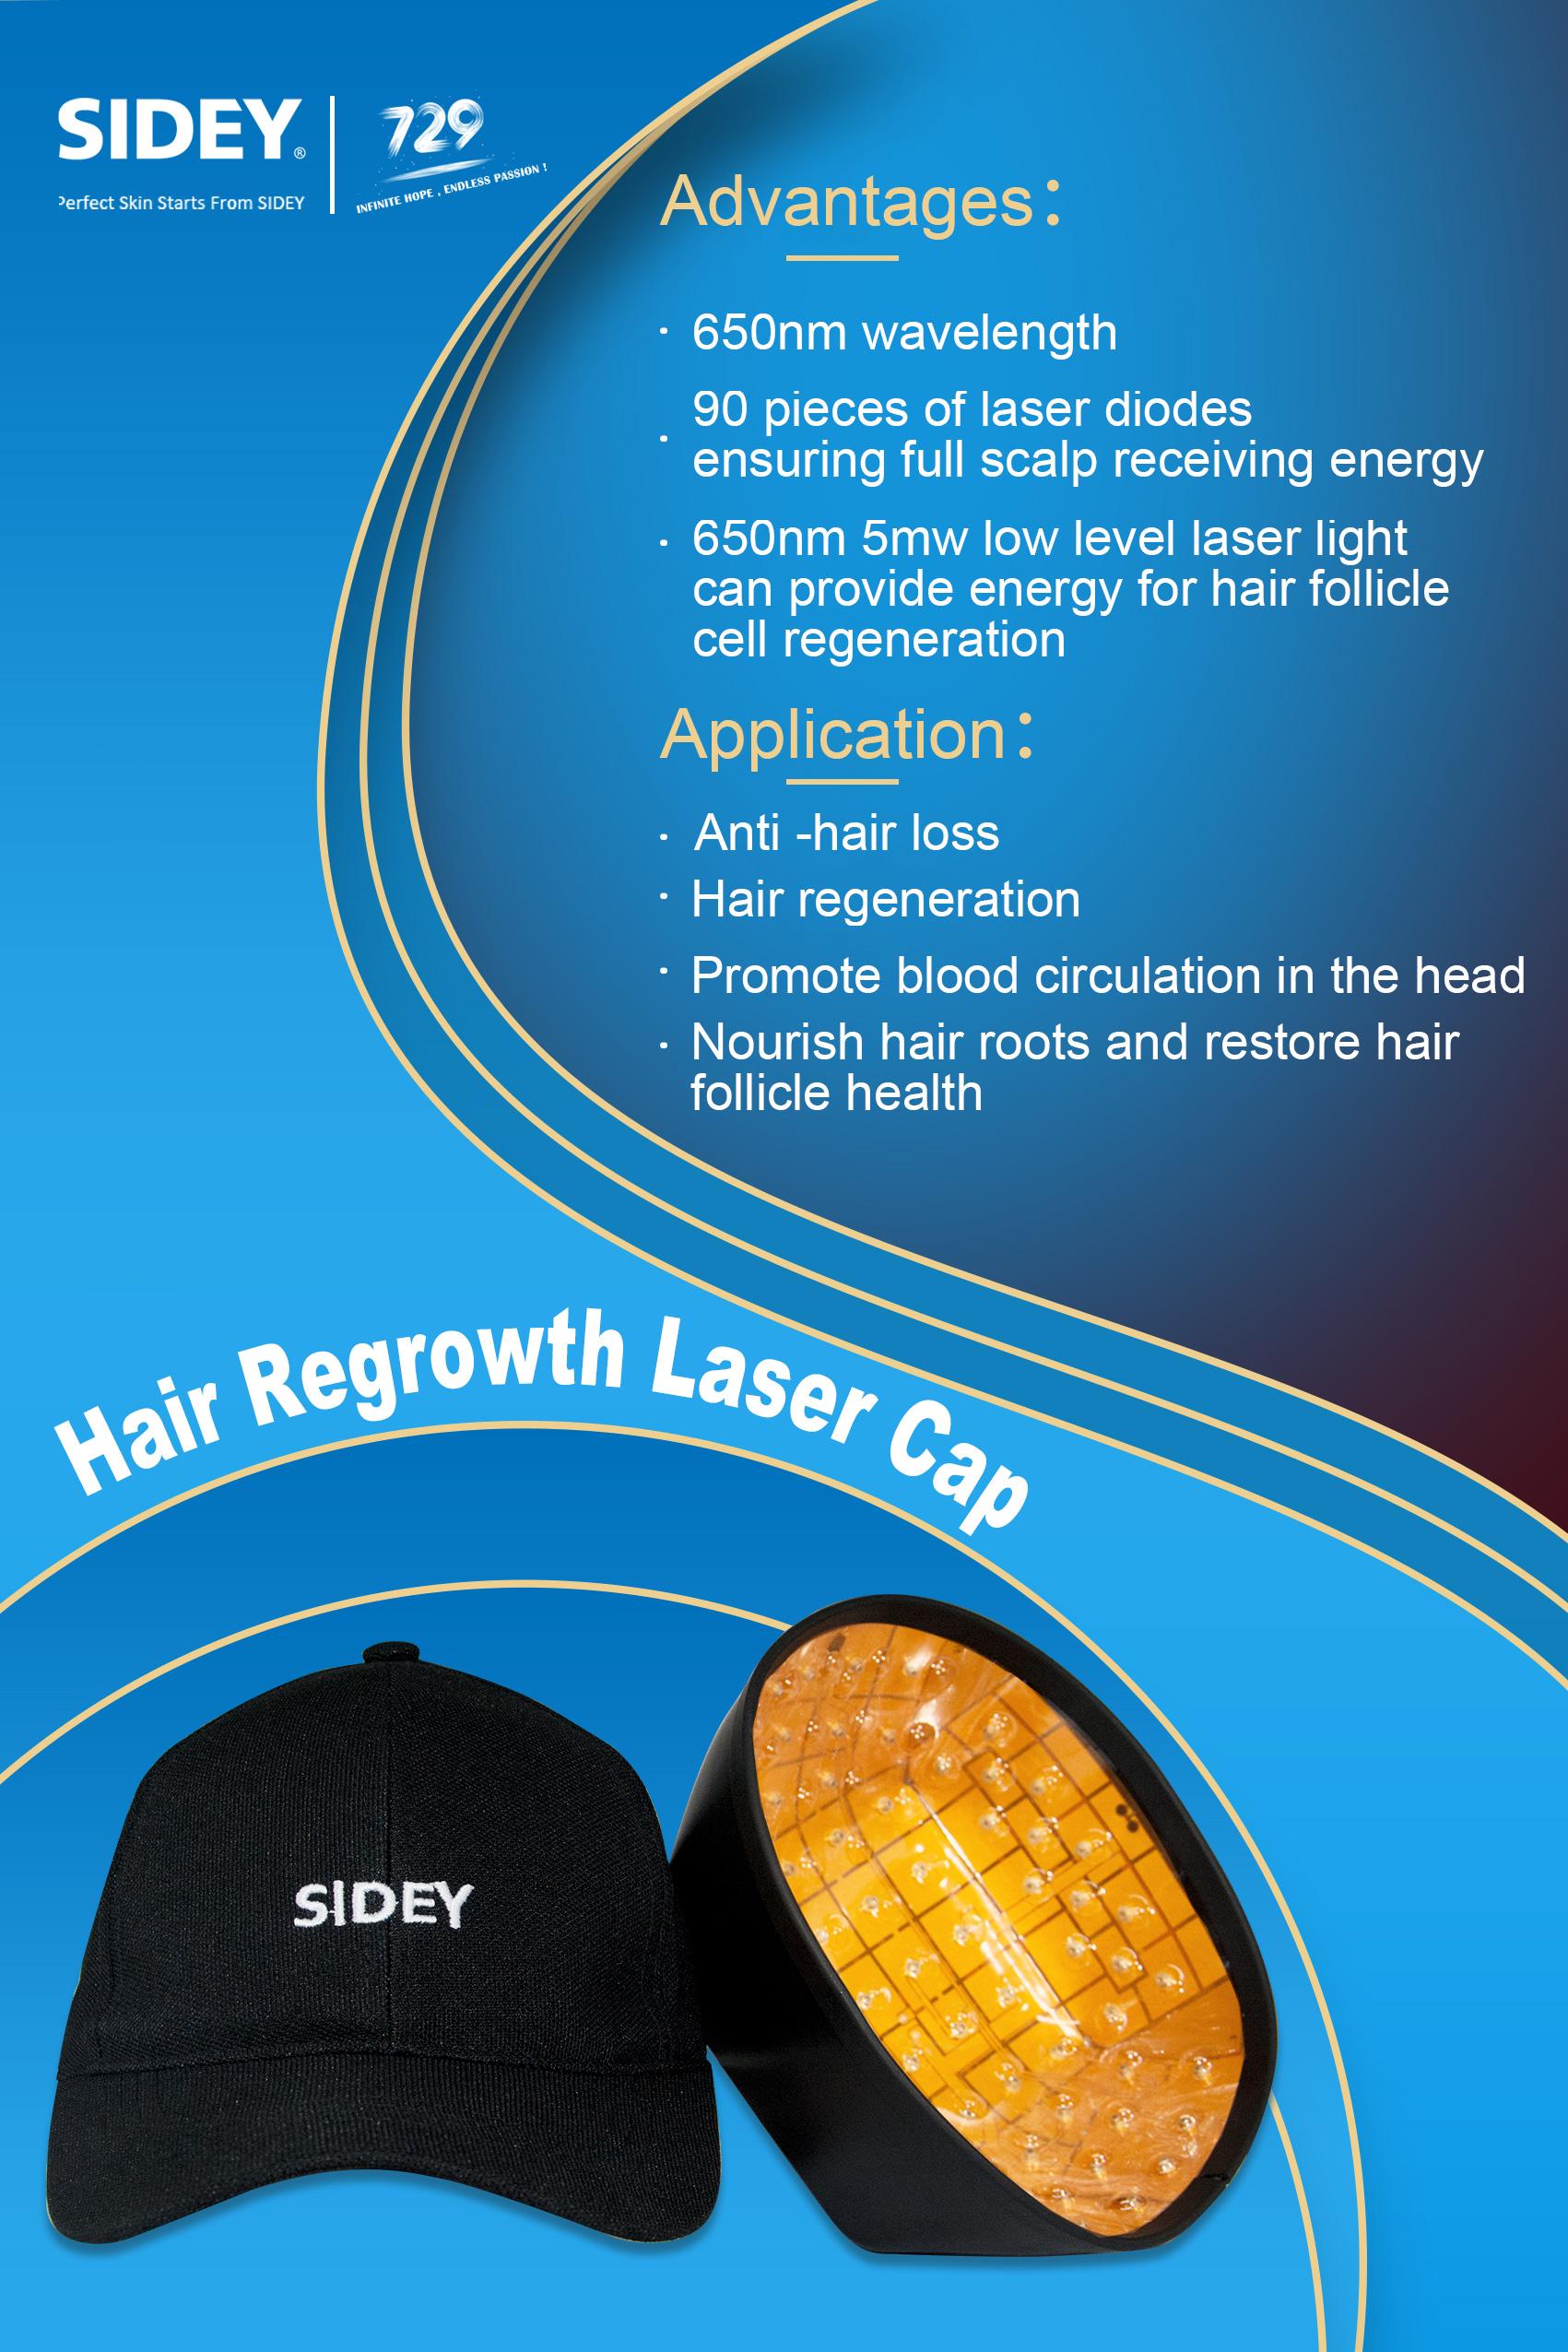 Sidey Hair Regrowth Laser Cap